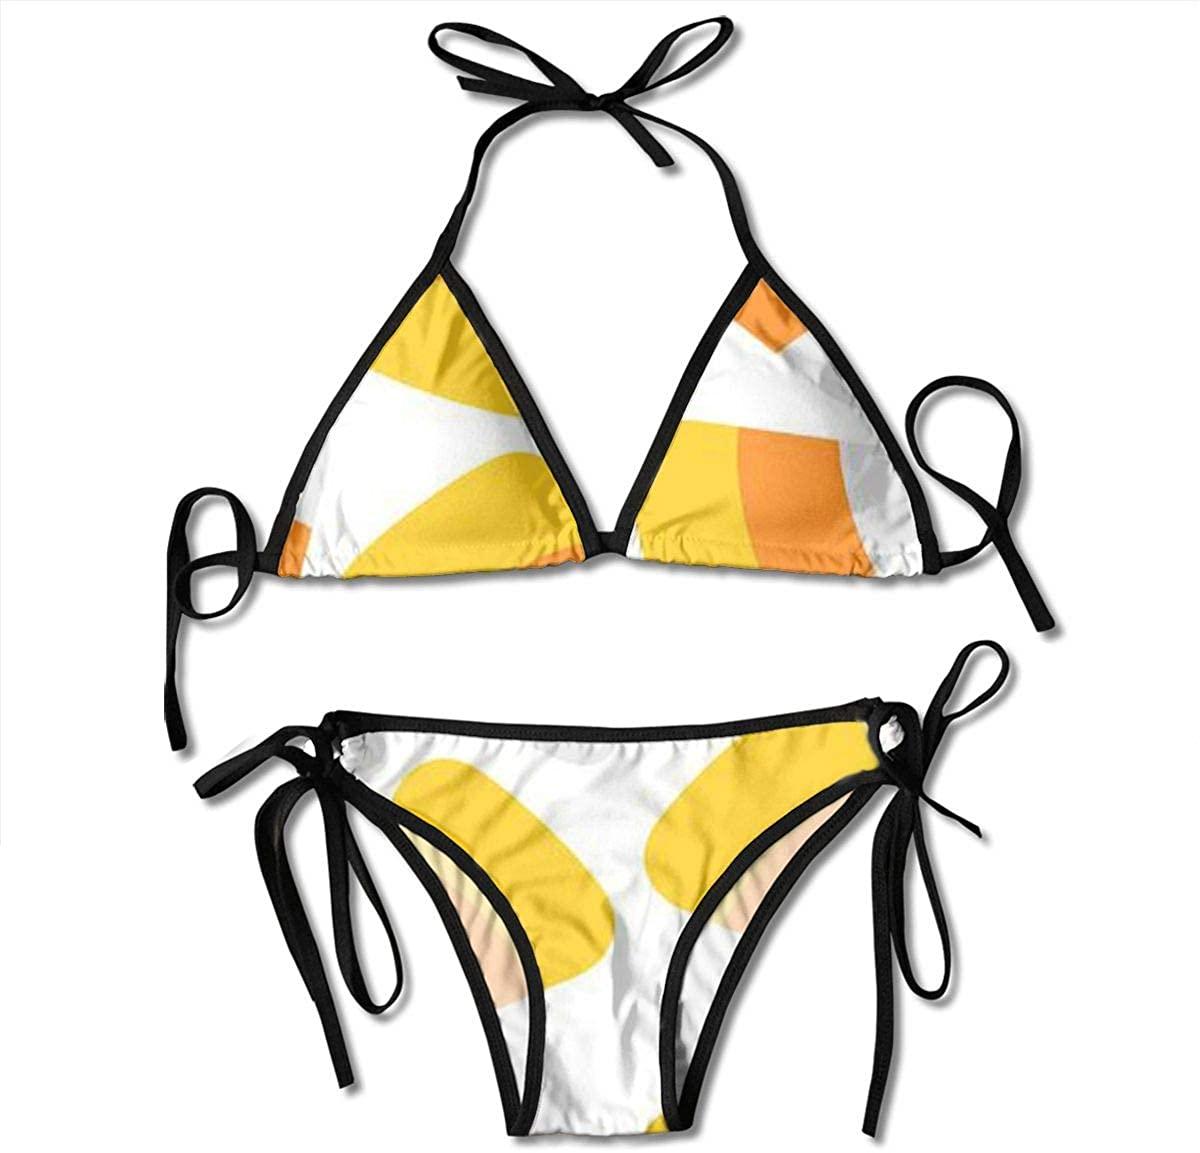 ZMagwa Women's String Triangle Bikini Set Two Piece Happy Halloween Candy Corn Swimsuit Black